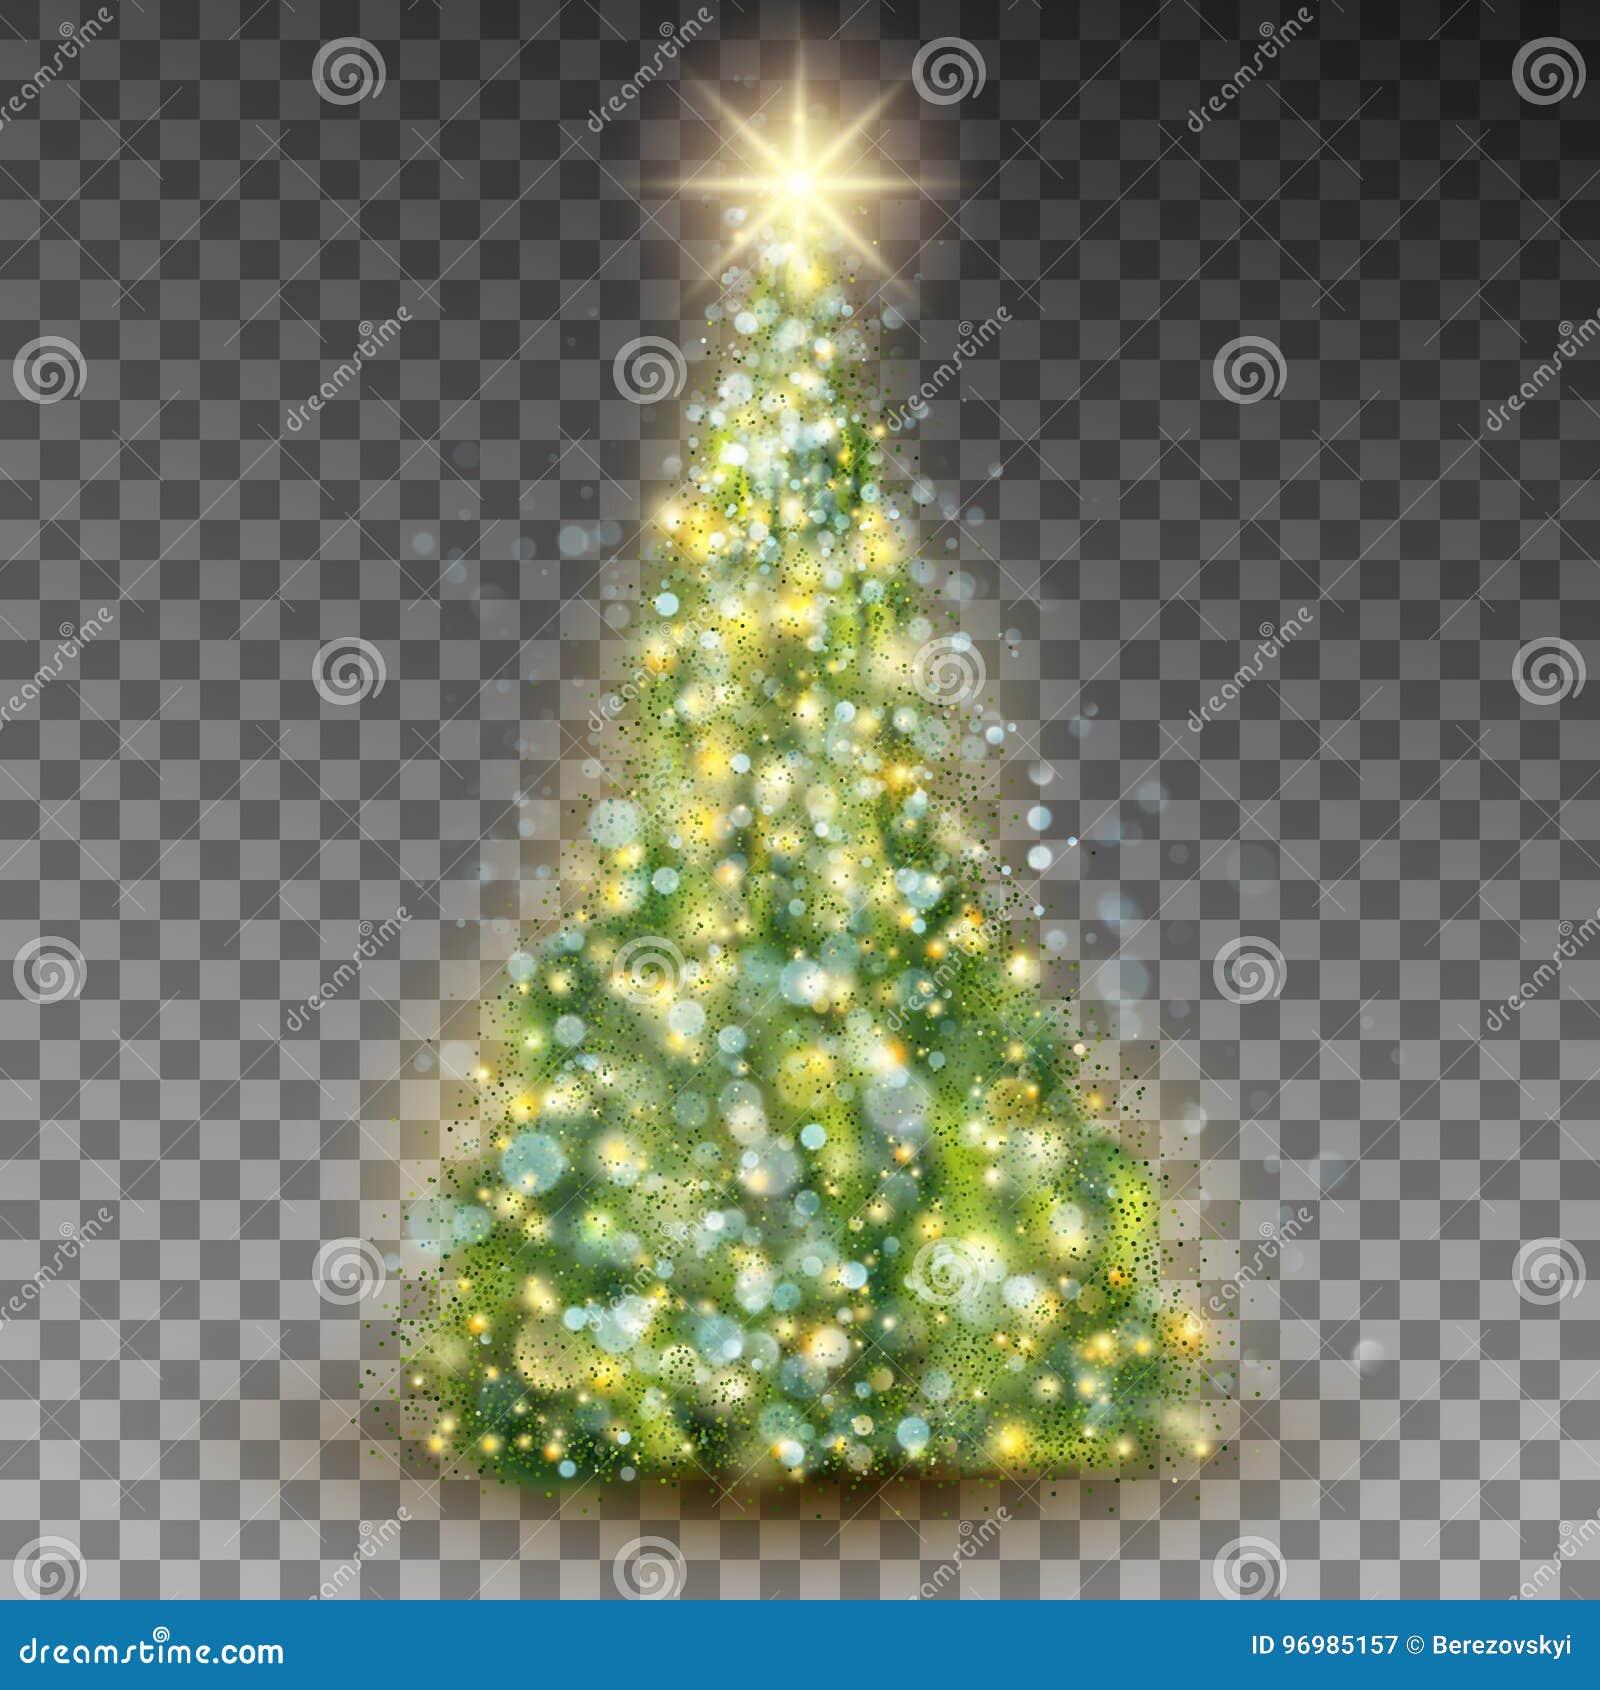 Grüner abstrakter Weihnachtsbaum Vektor ENV 10